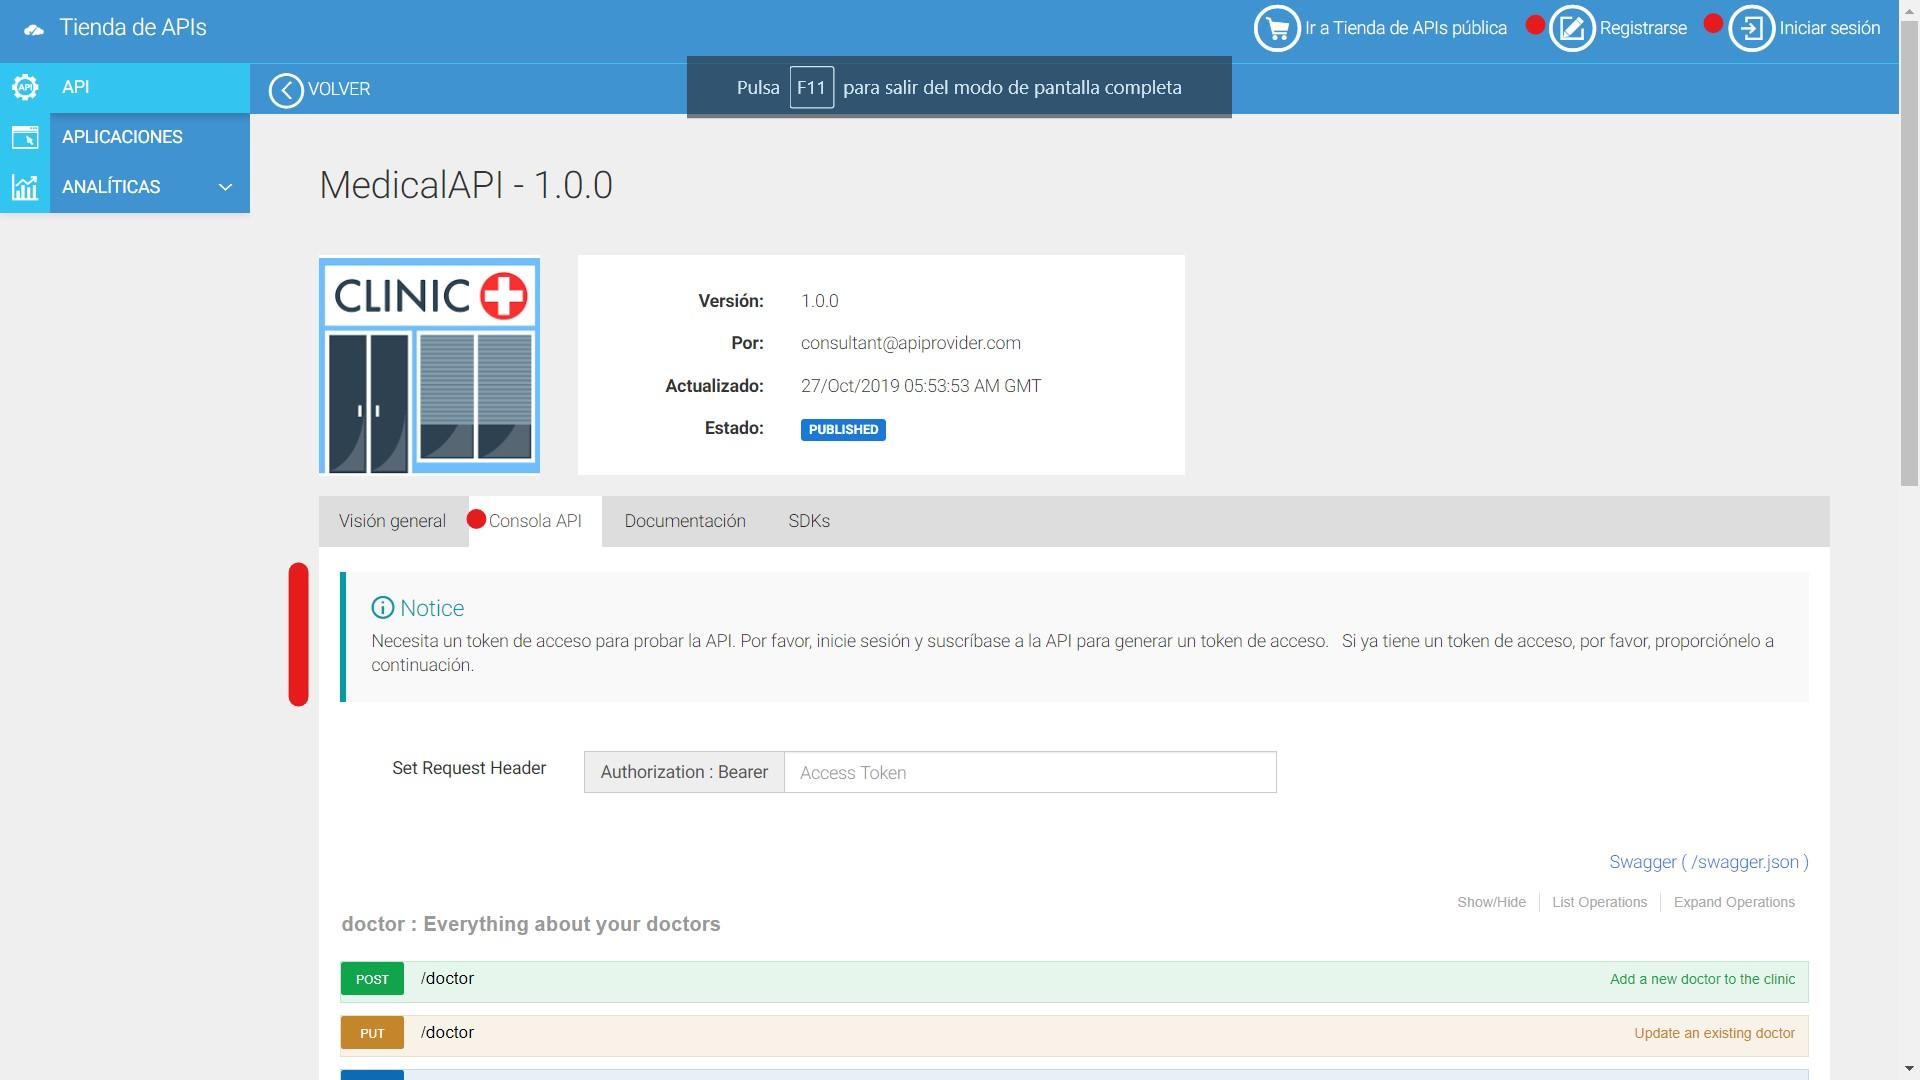 Anonimo Consola API